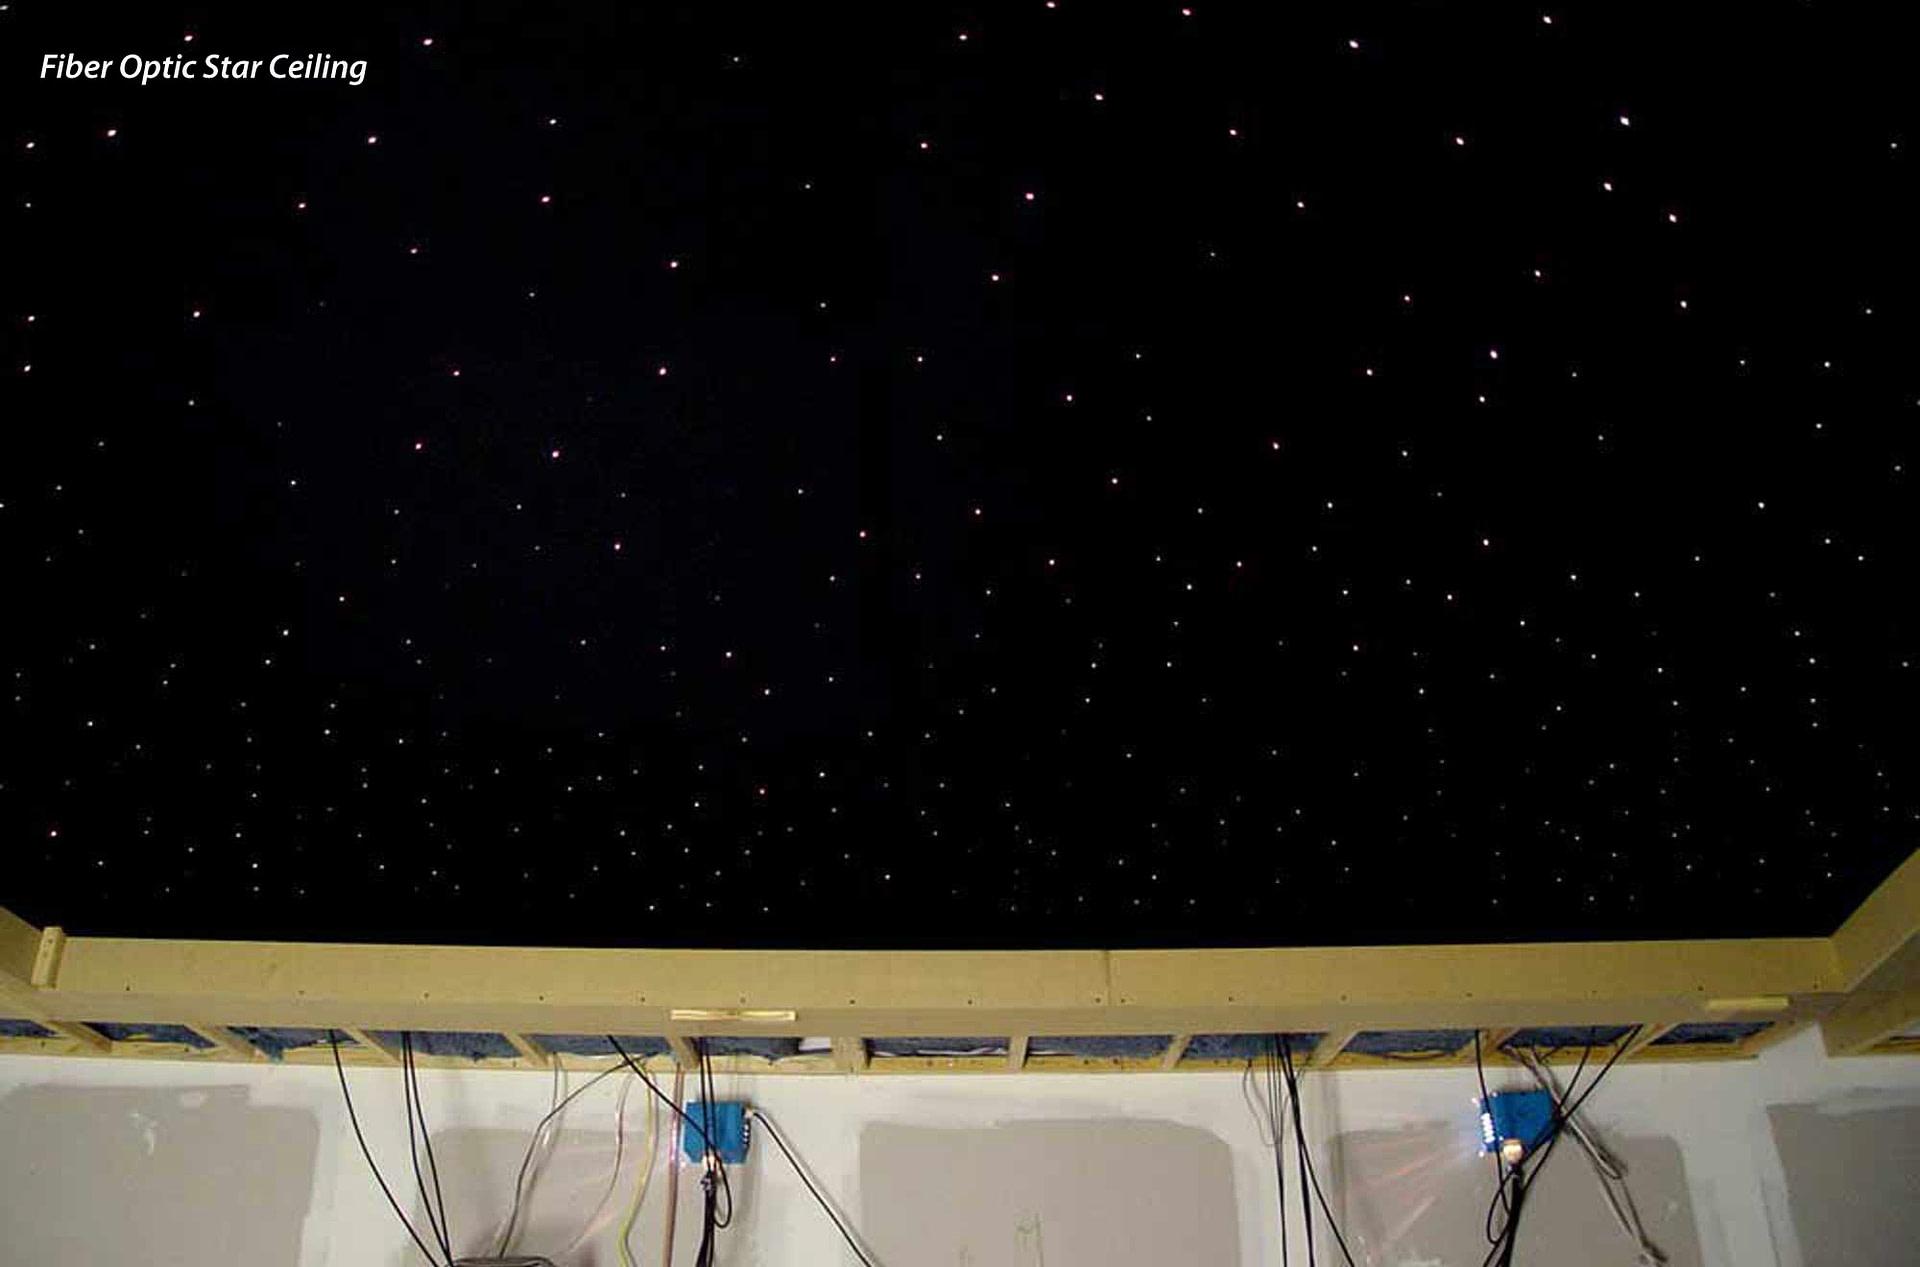 Star Ceiling Fiber Optics Or Painted